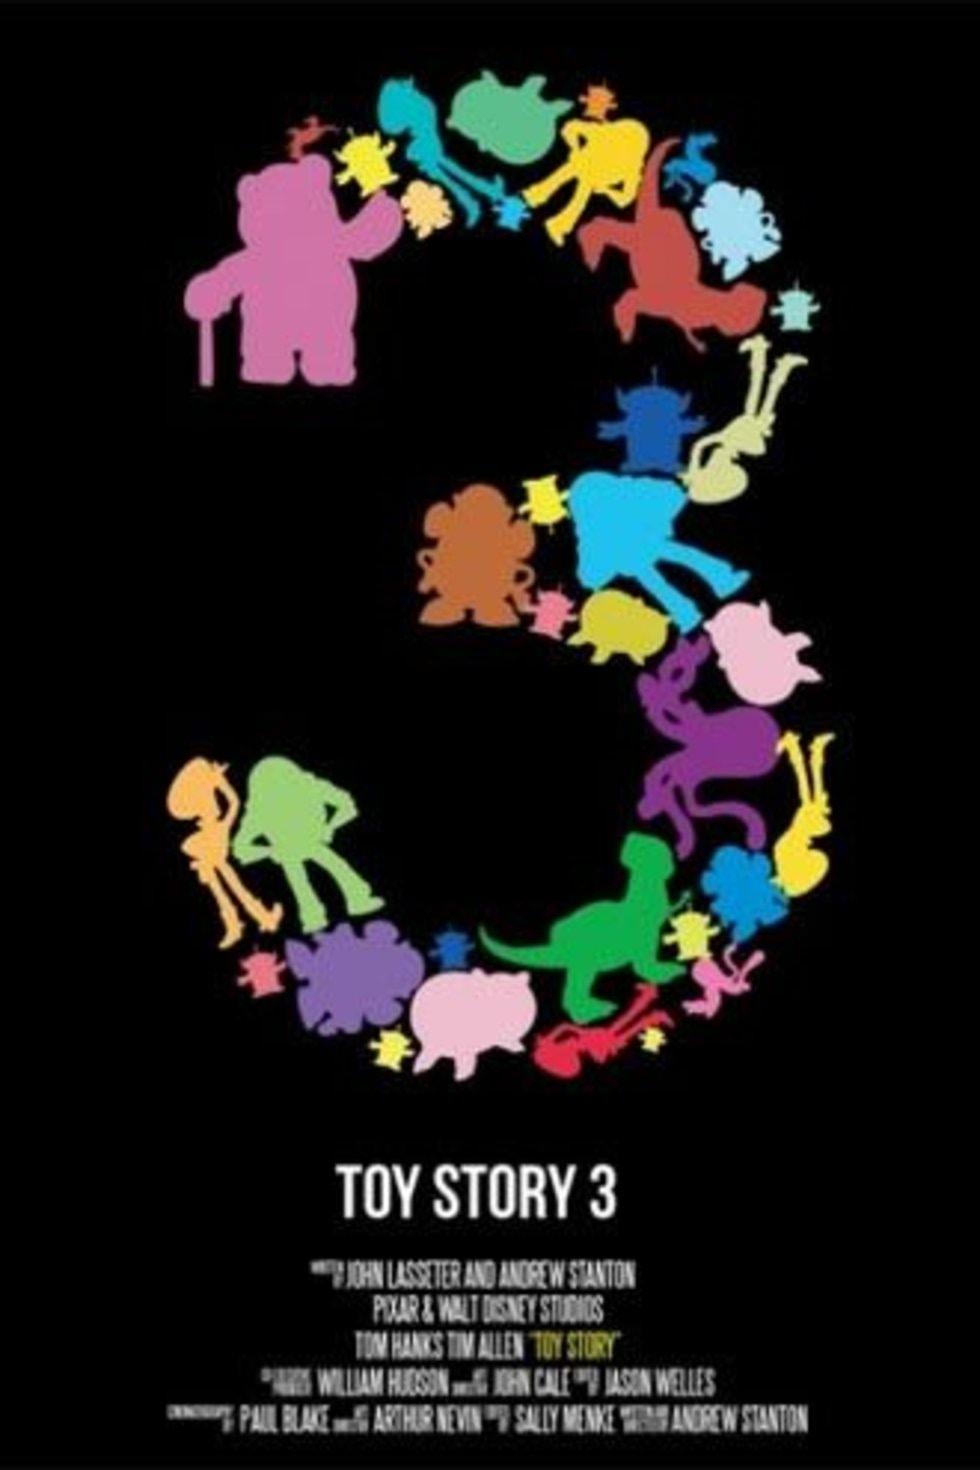 toy story film serisi